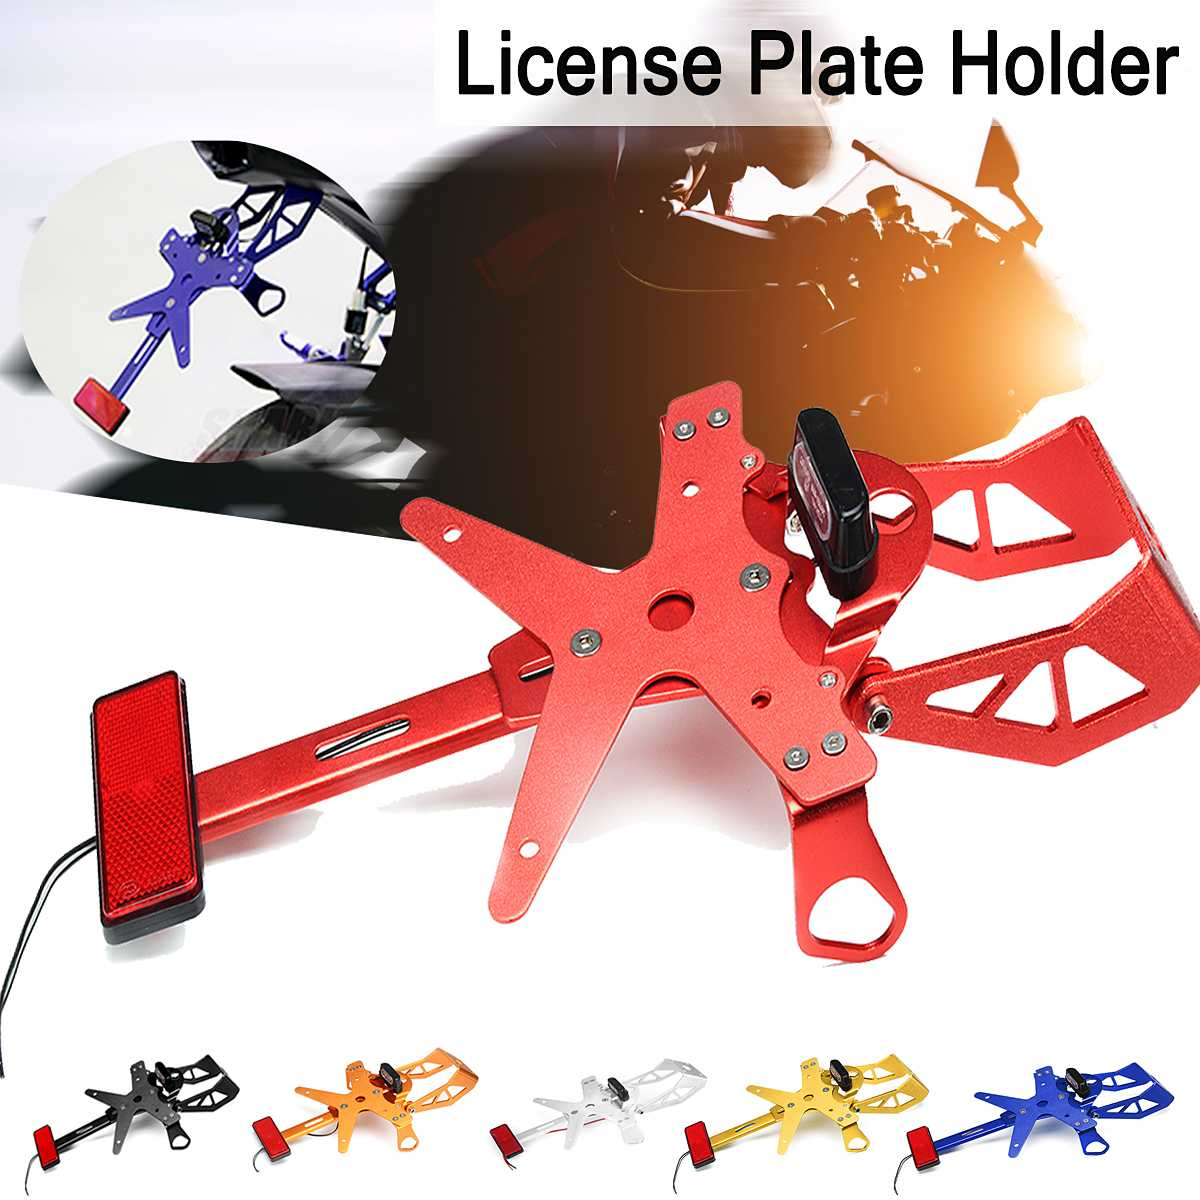 Motorcycle License Plate Holder Bracket Aluminum For Yamaha R1/R3 MT-09/07 For KAWASAKI Z800/1000